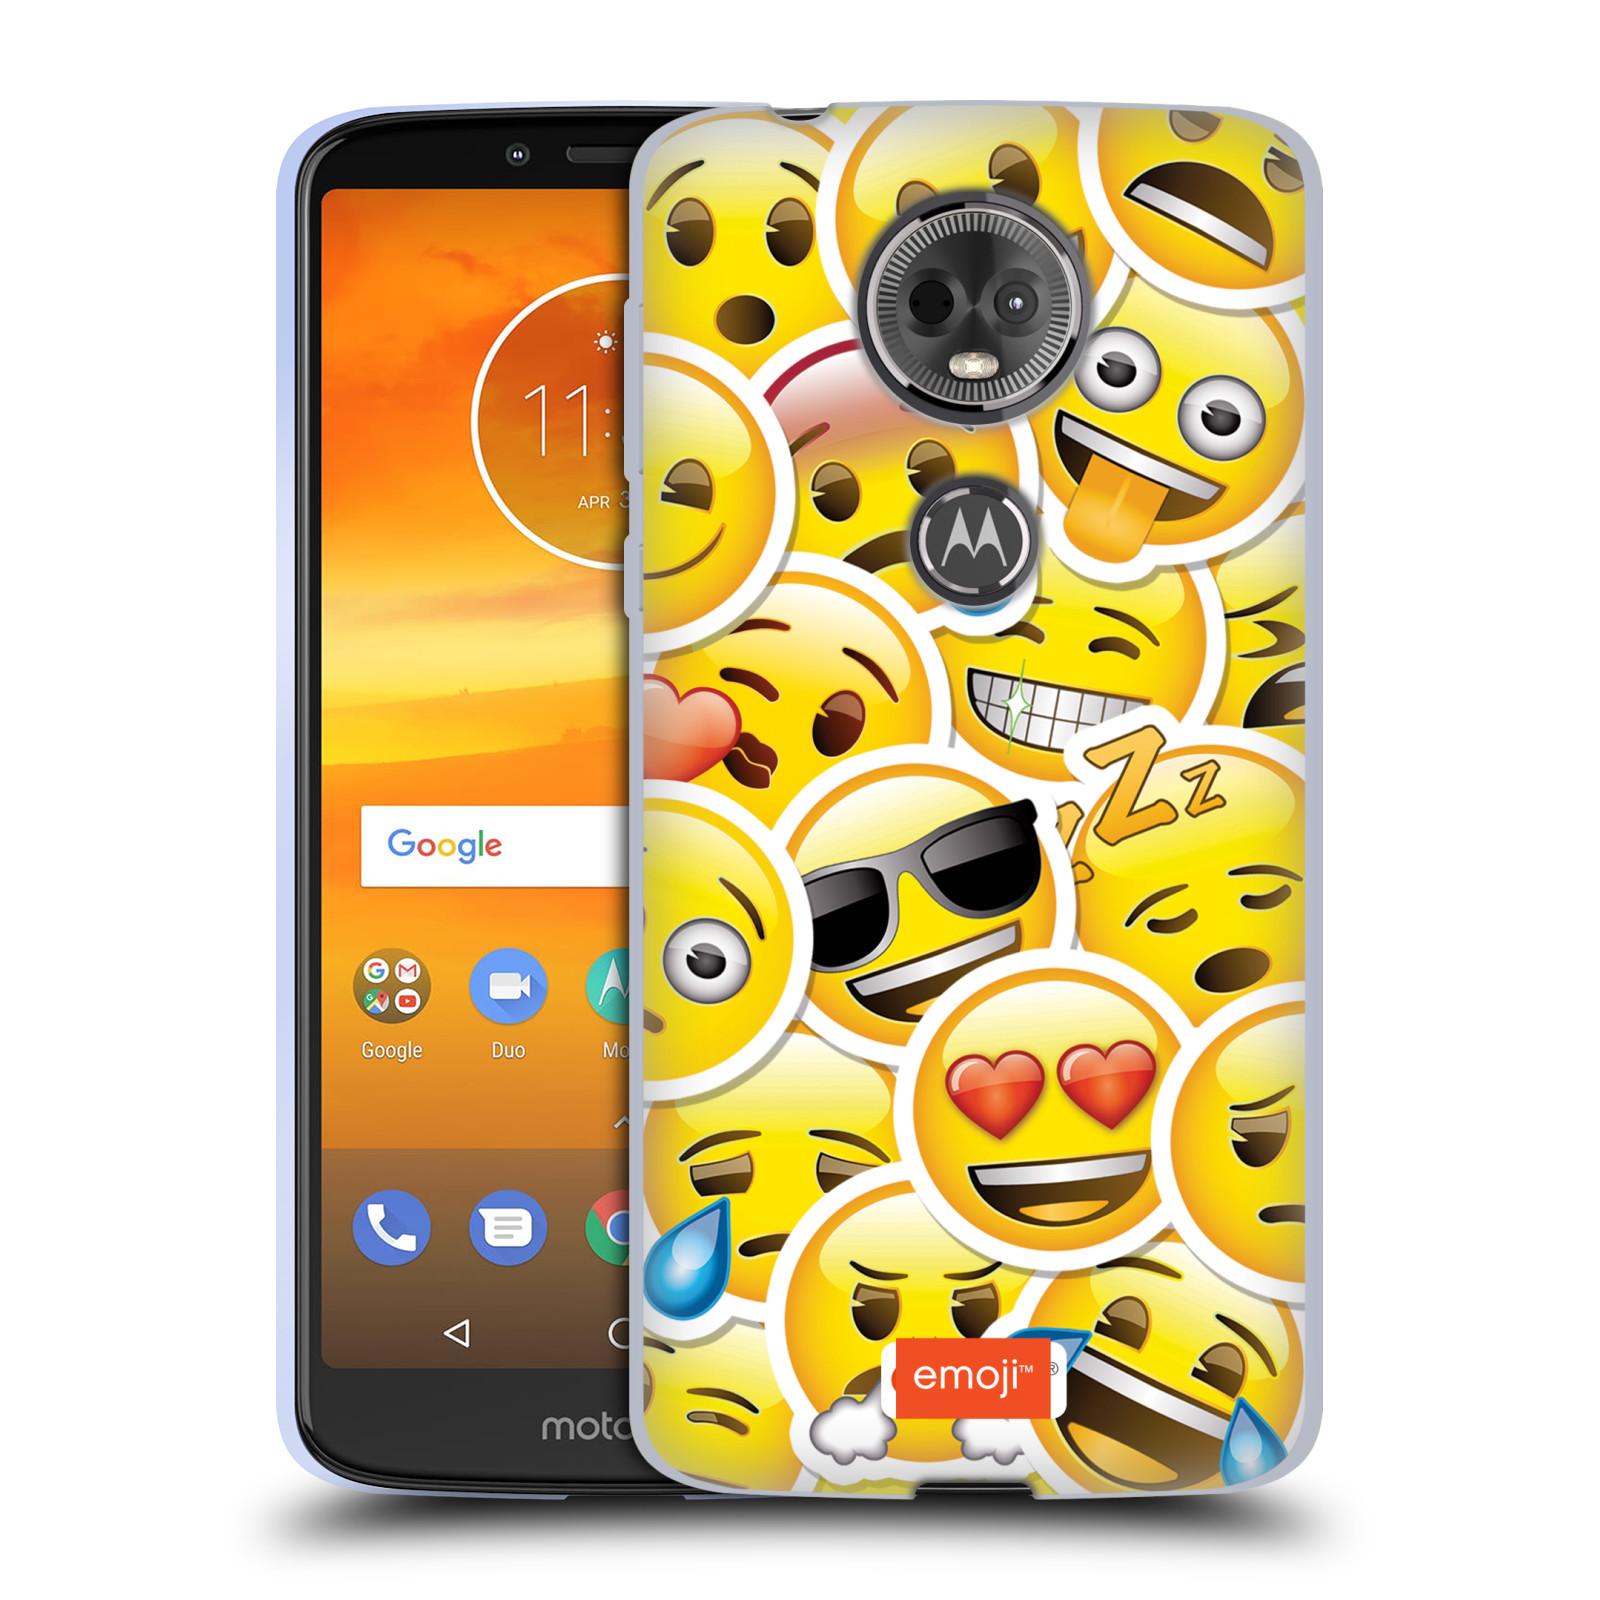 Silikonové pouzdro na mobil Motorola Moto E5 Plus - Head Case - EMOJI - Velcí smajlíci ZZ